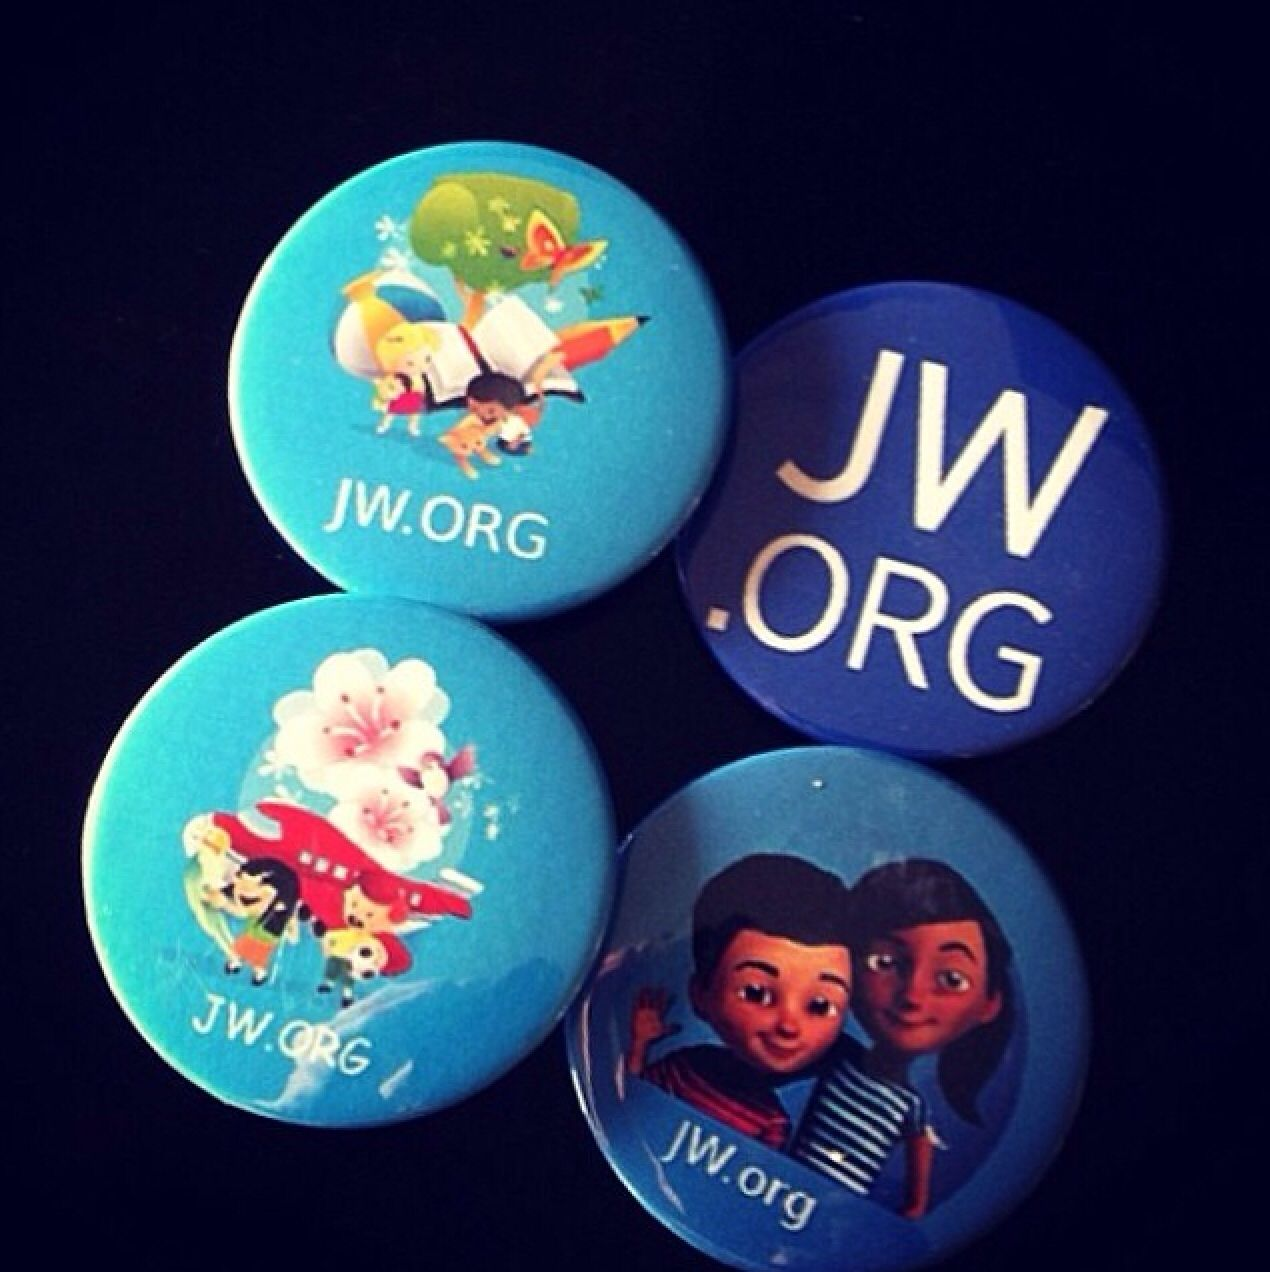 Jw online-dating-site